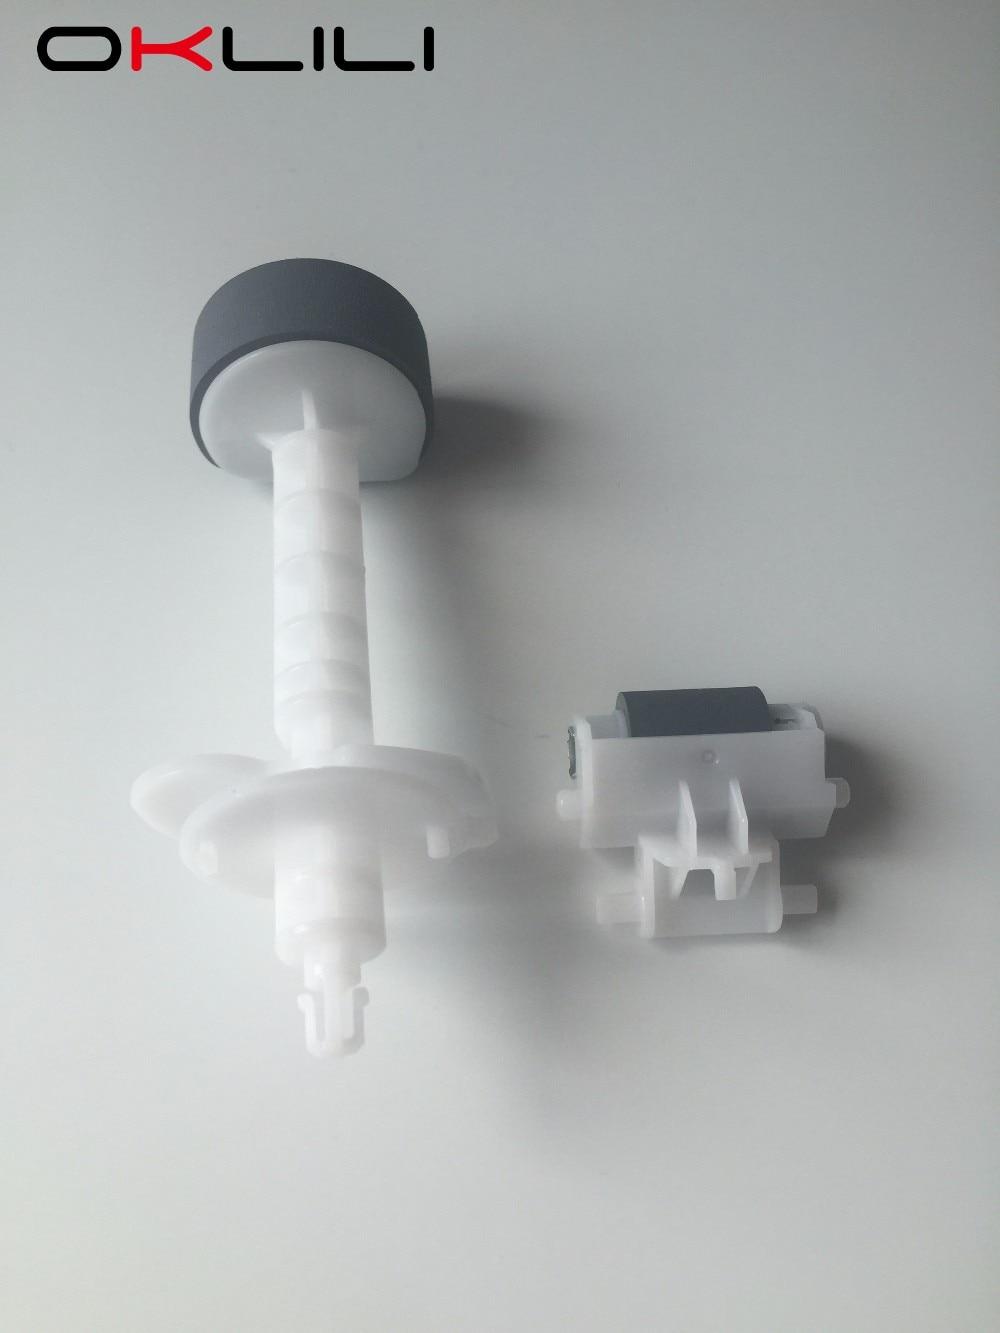 5 SET X ORIGINAL nuevo alimentar Pickup Roller Kit para Epson ME10 L110 L111 L120 L130 L210 L220 L211 L300 l301 L303 L310 L350 L351 L353